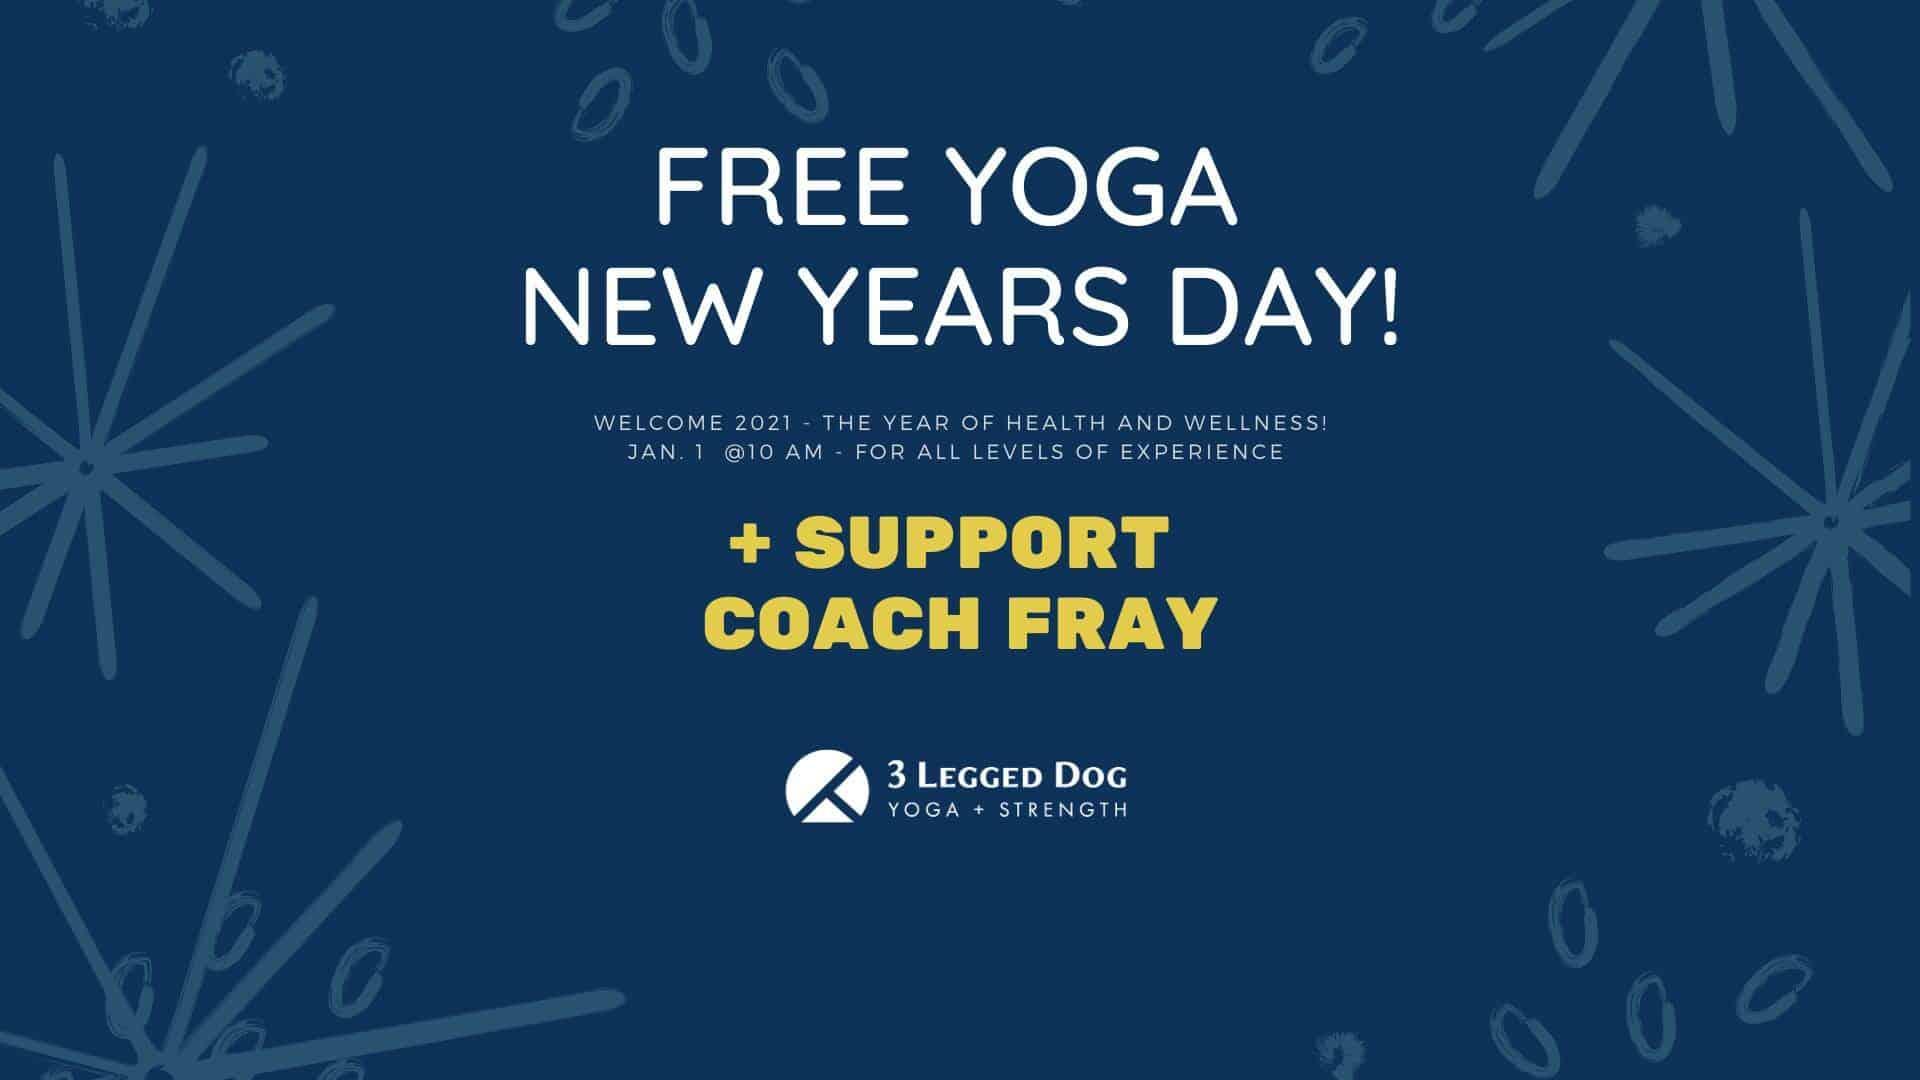 Free New Years Day Yoga